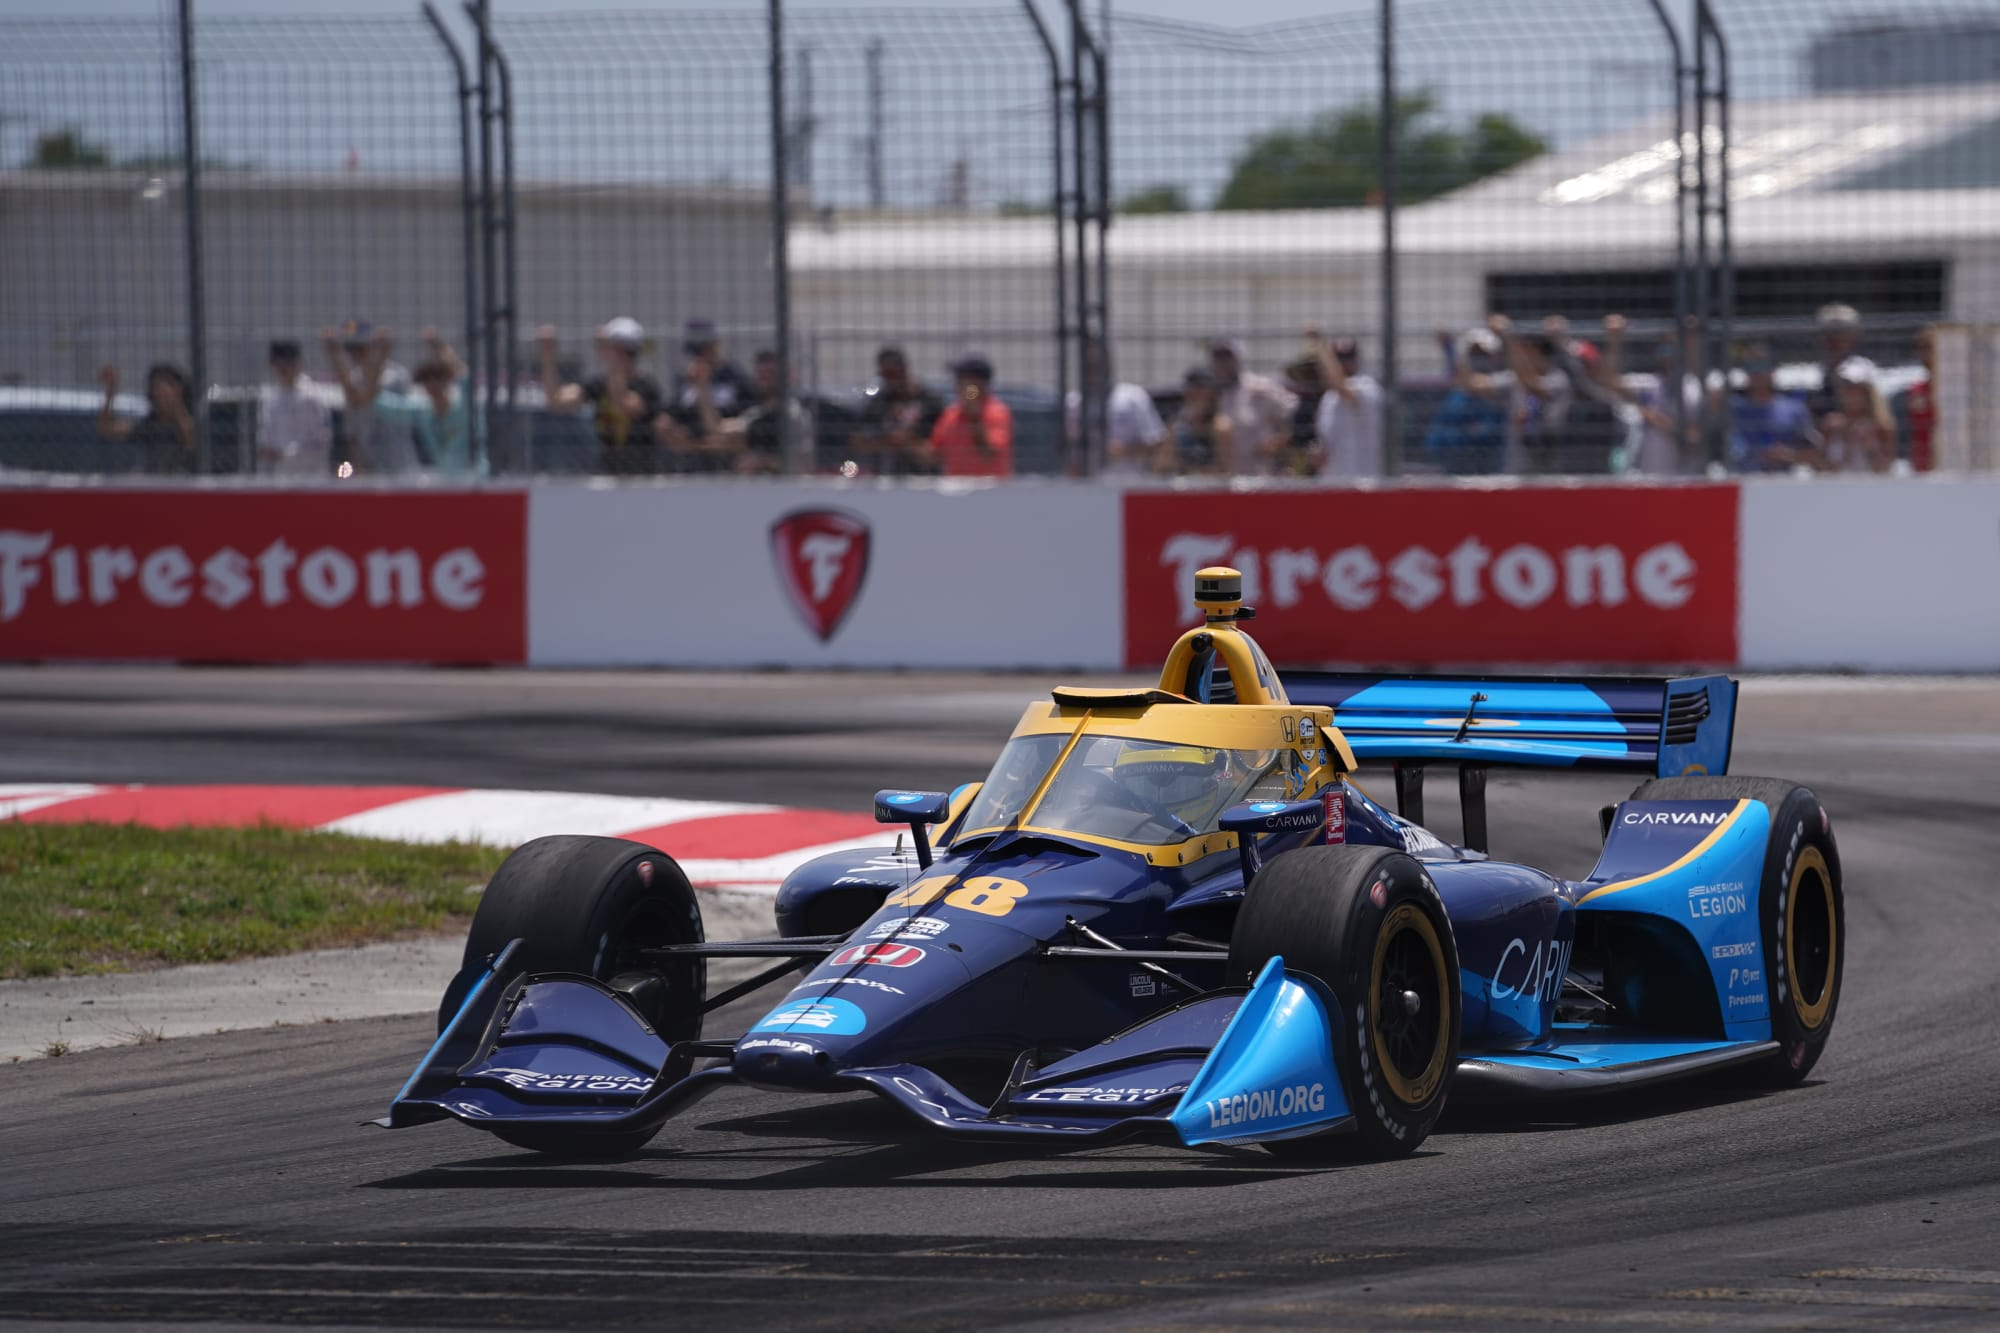 IndyCar: Jimmie Johnson explains why he has struggled